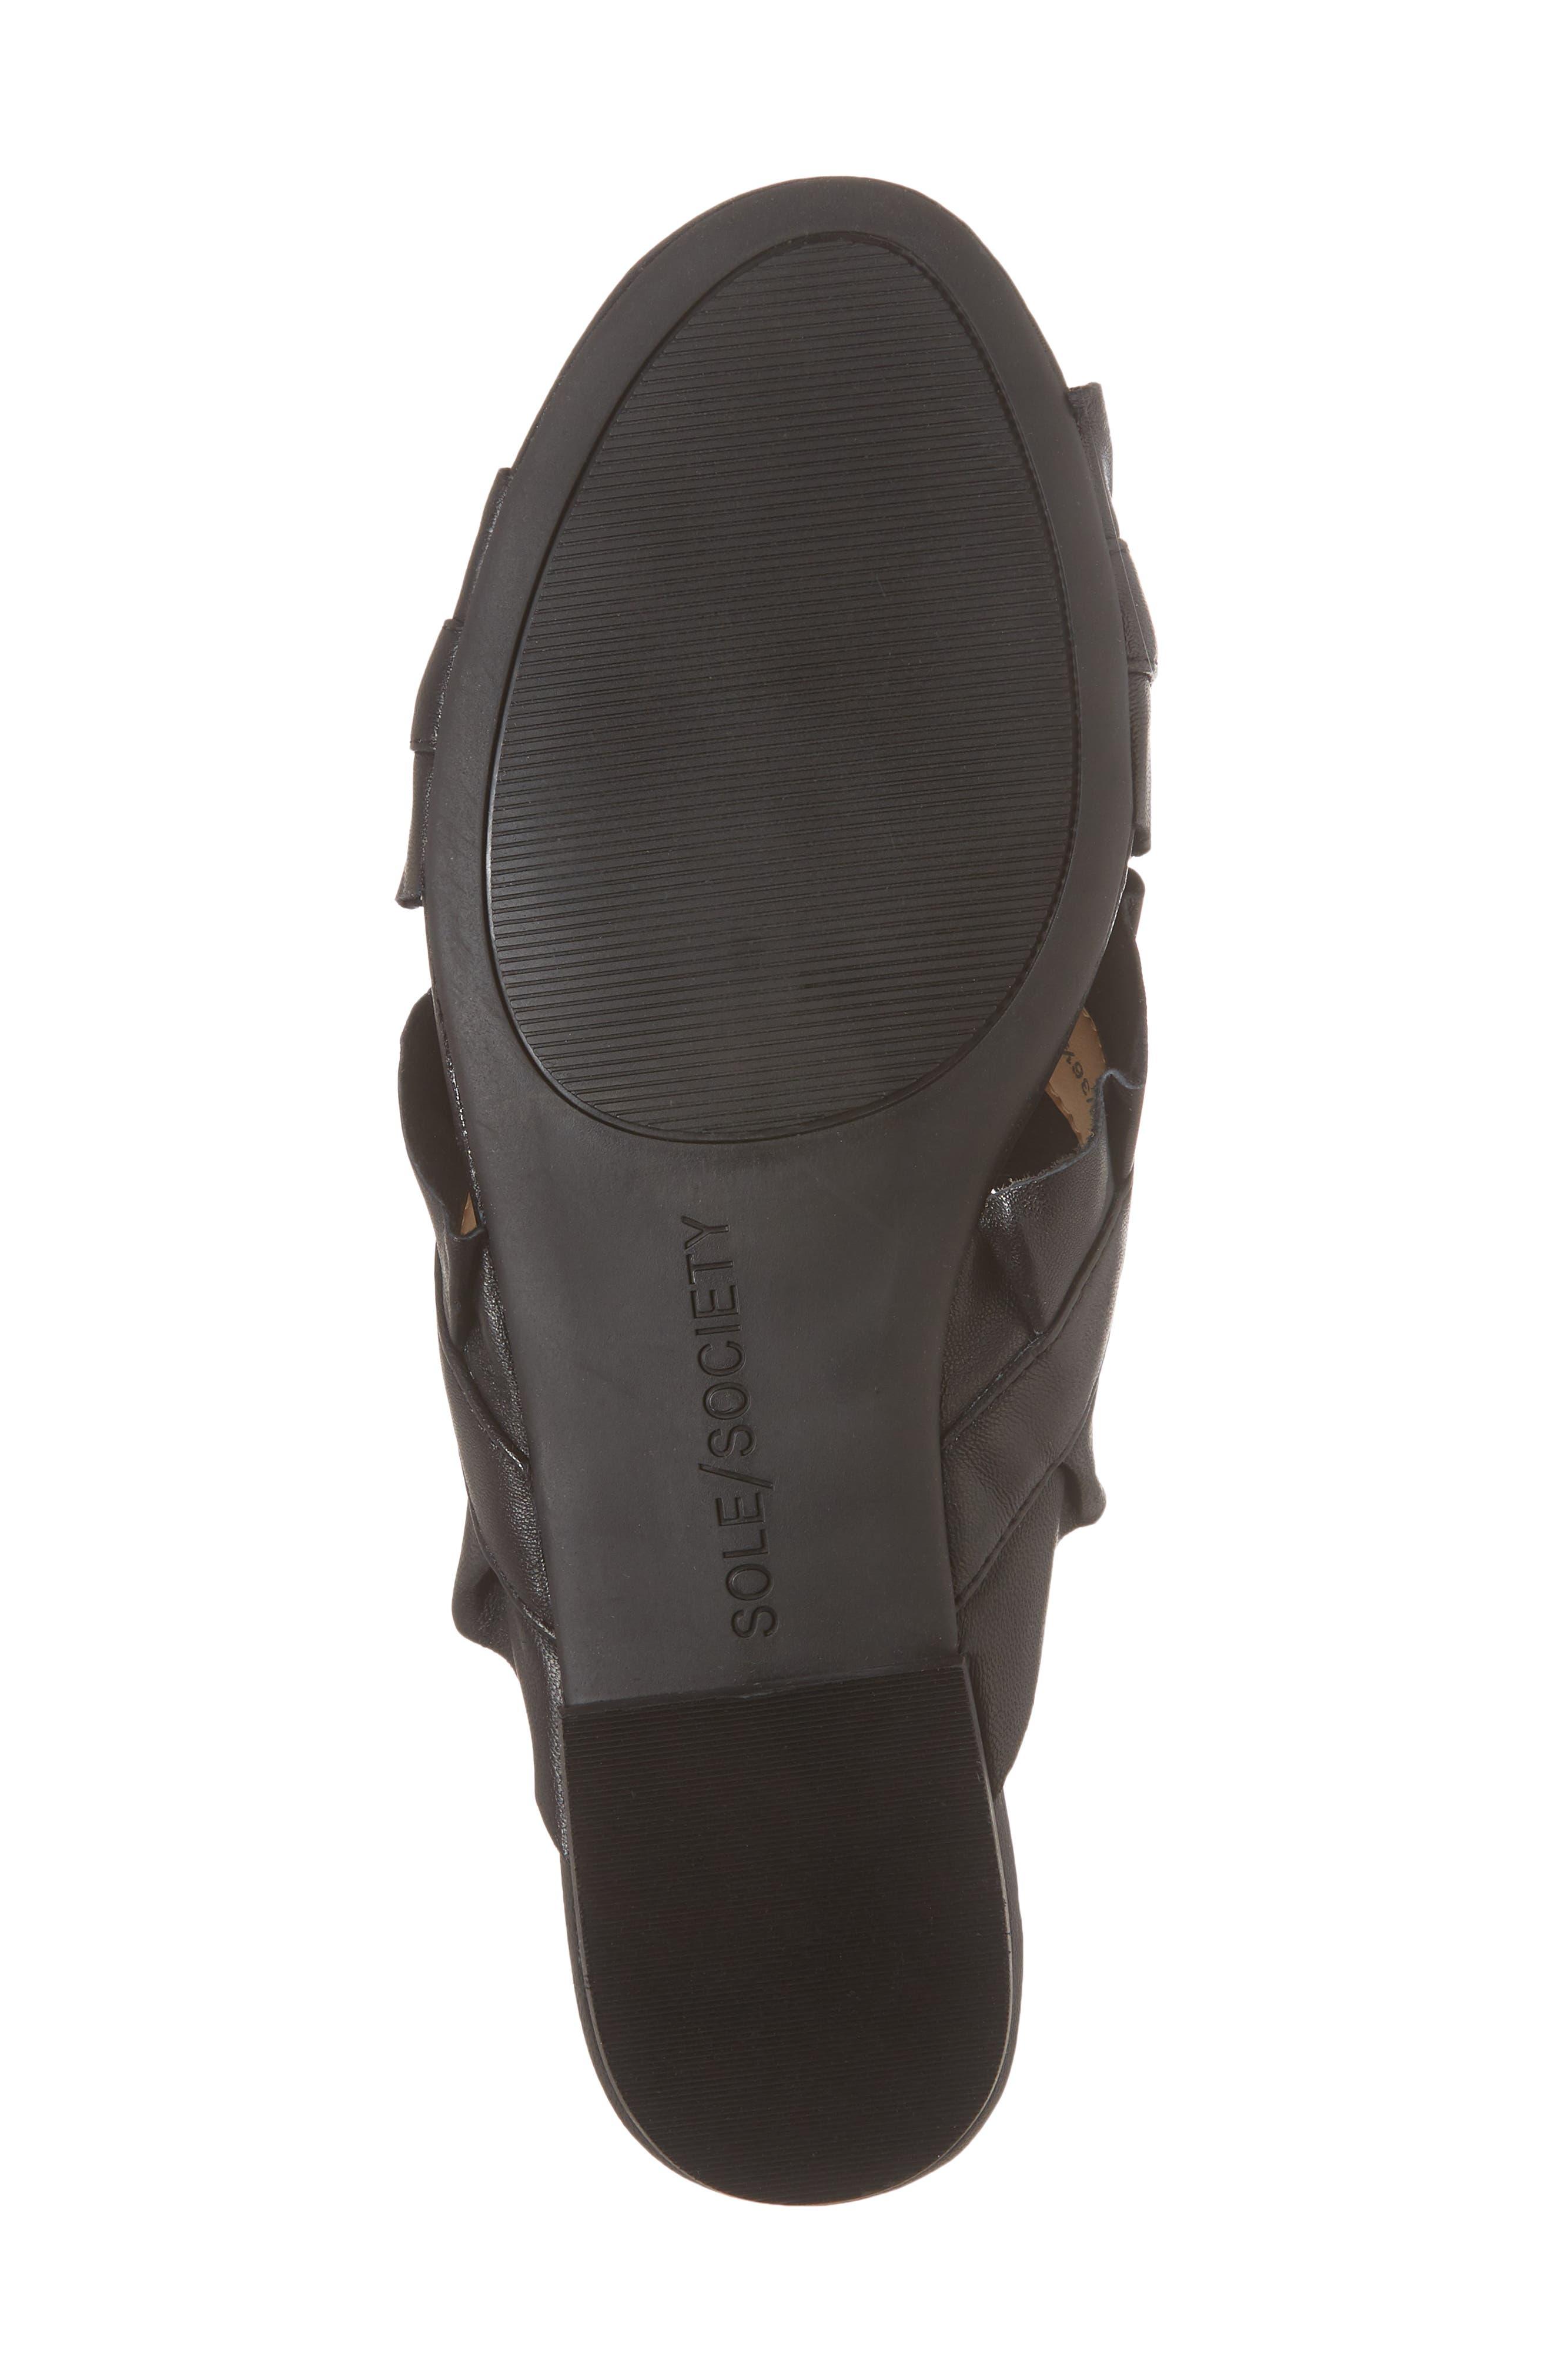 SOLE SOCIETY,                             Mandi Slide Sandal,                             Alternate thumbnail 6, color,                             BLACK